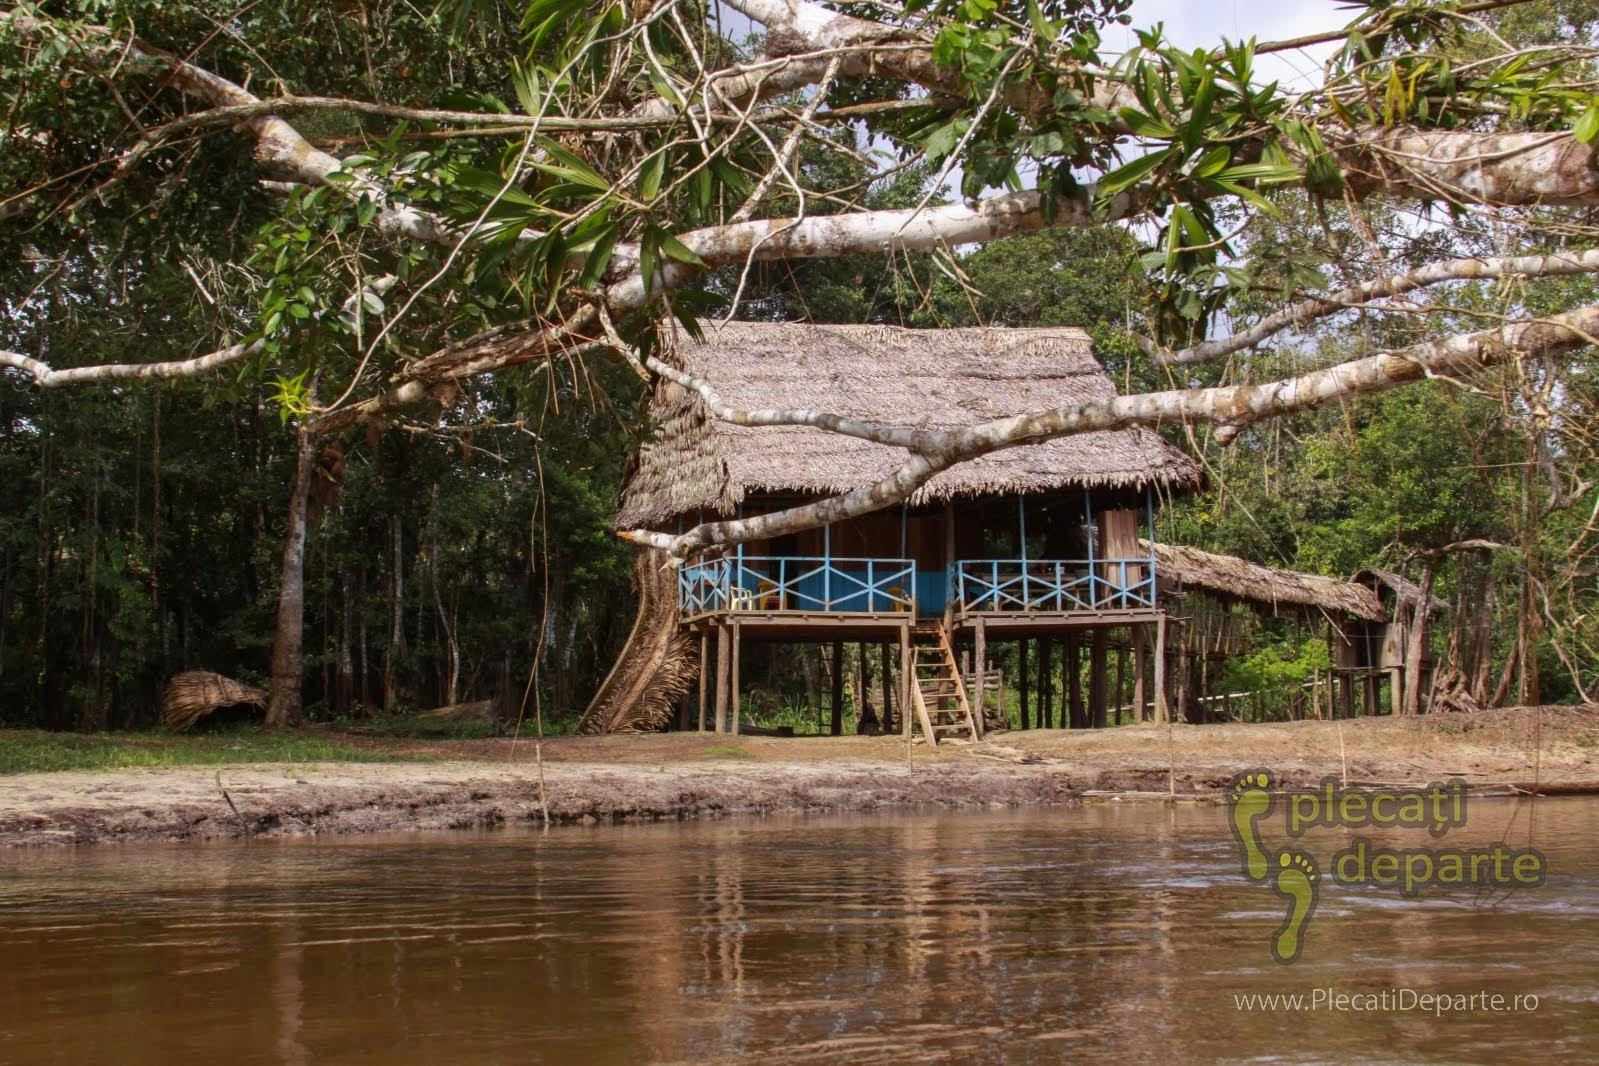 Refugiu construit pe piloni de lemn, in jungla amazoniana, in Rezervatia Nationala Pacaya-Samiria, Peru